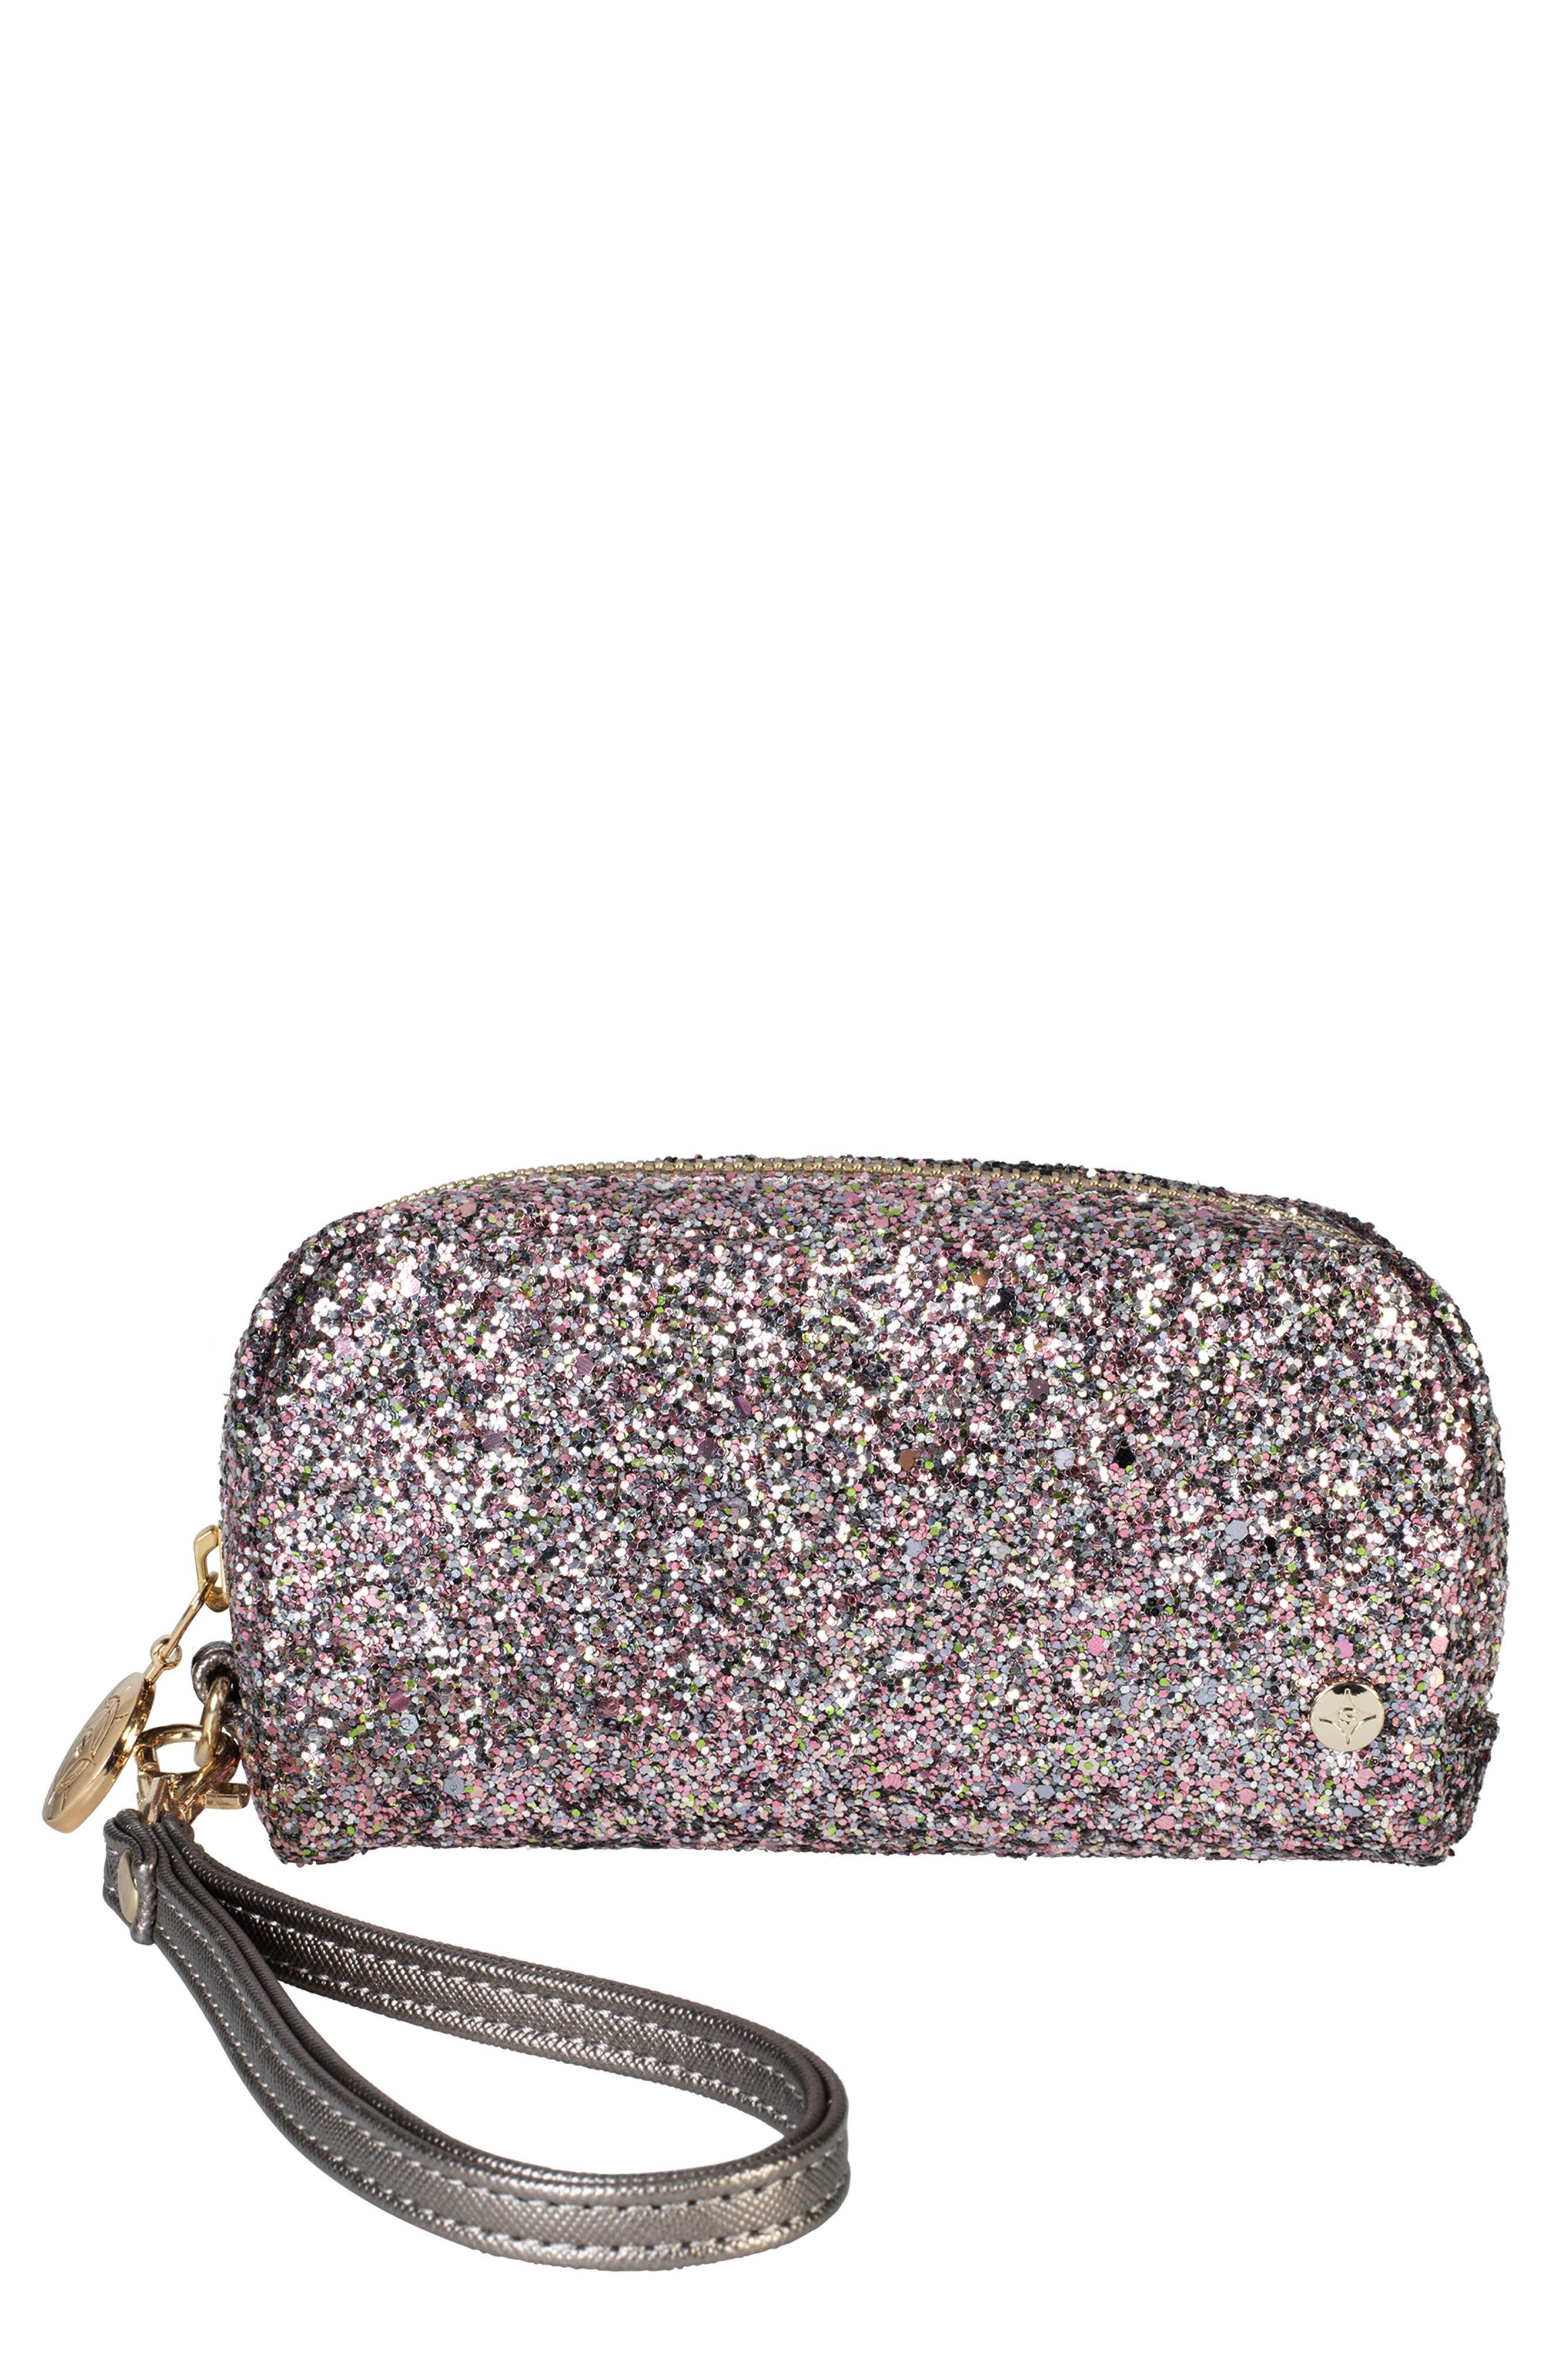 STEPHANIE JOHNSON Sparkle Mini Wristlet in Hollywood Pink